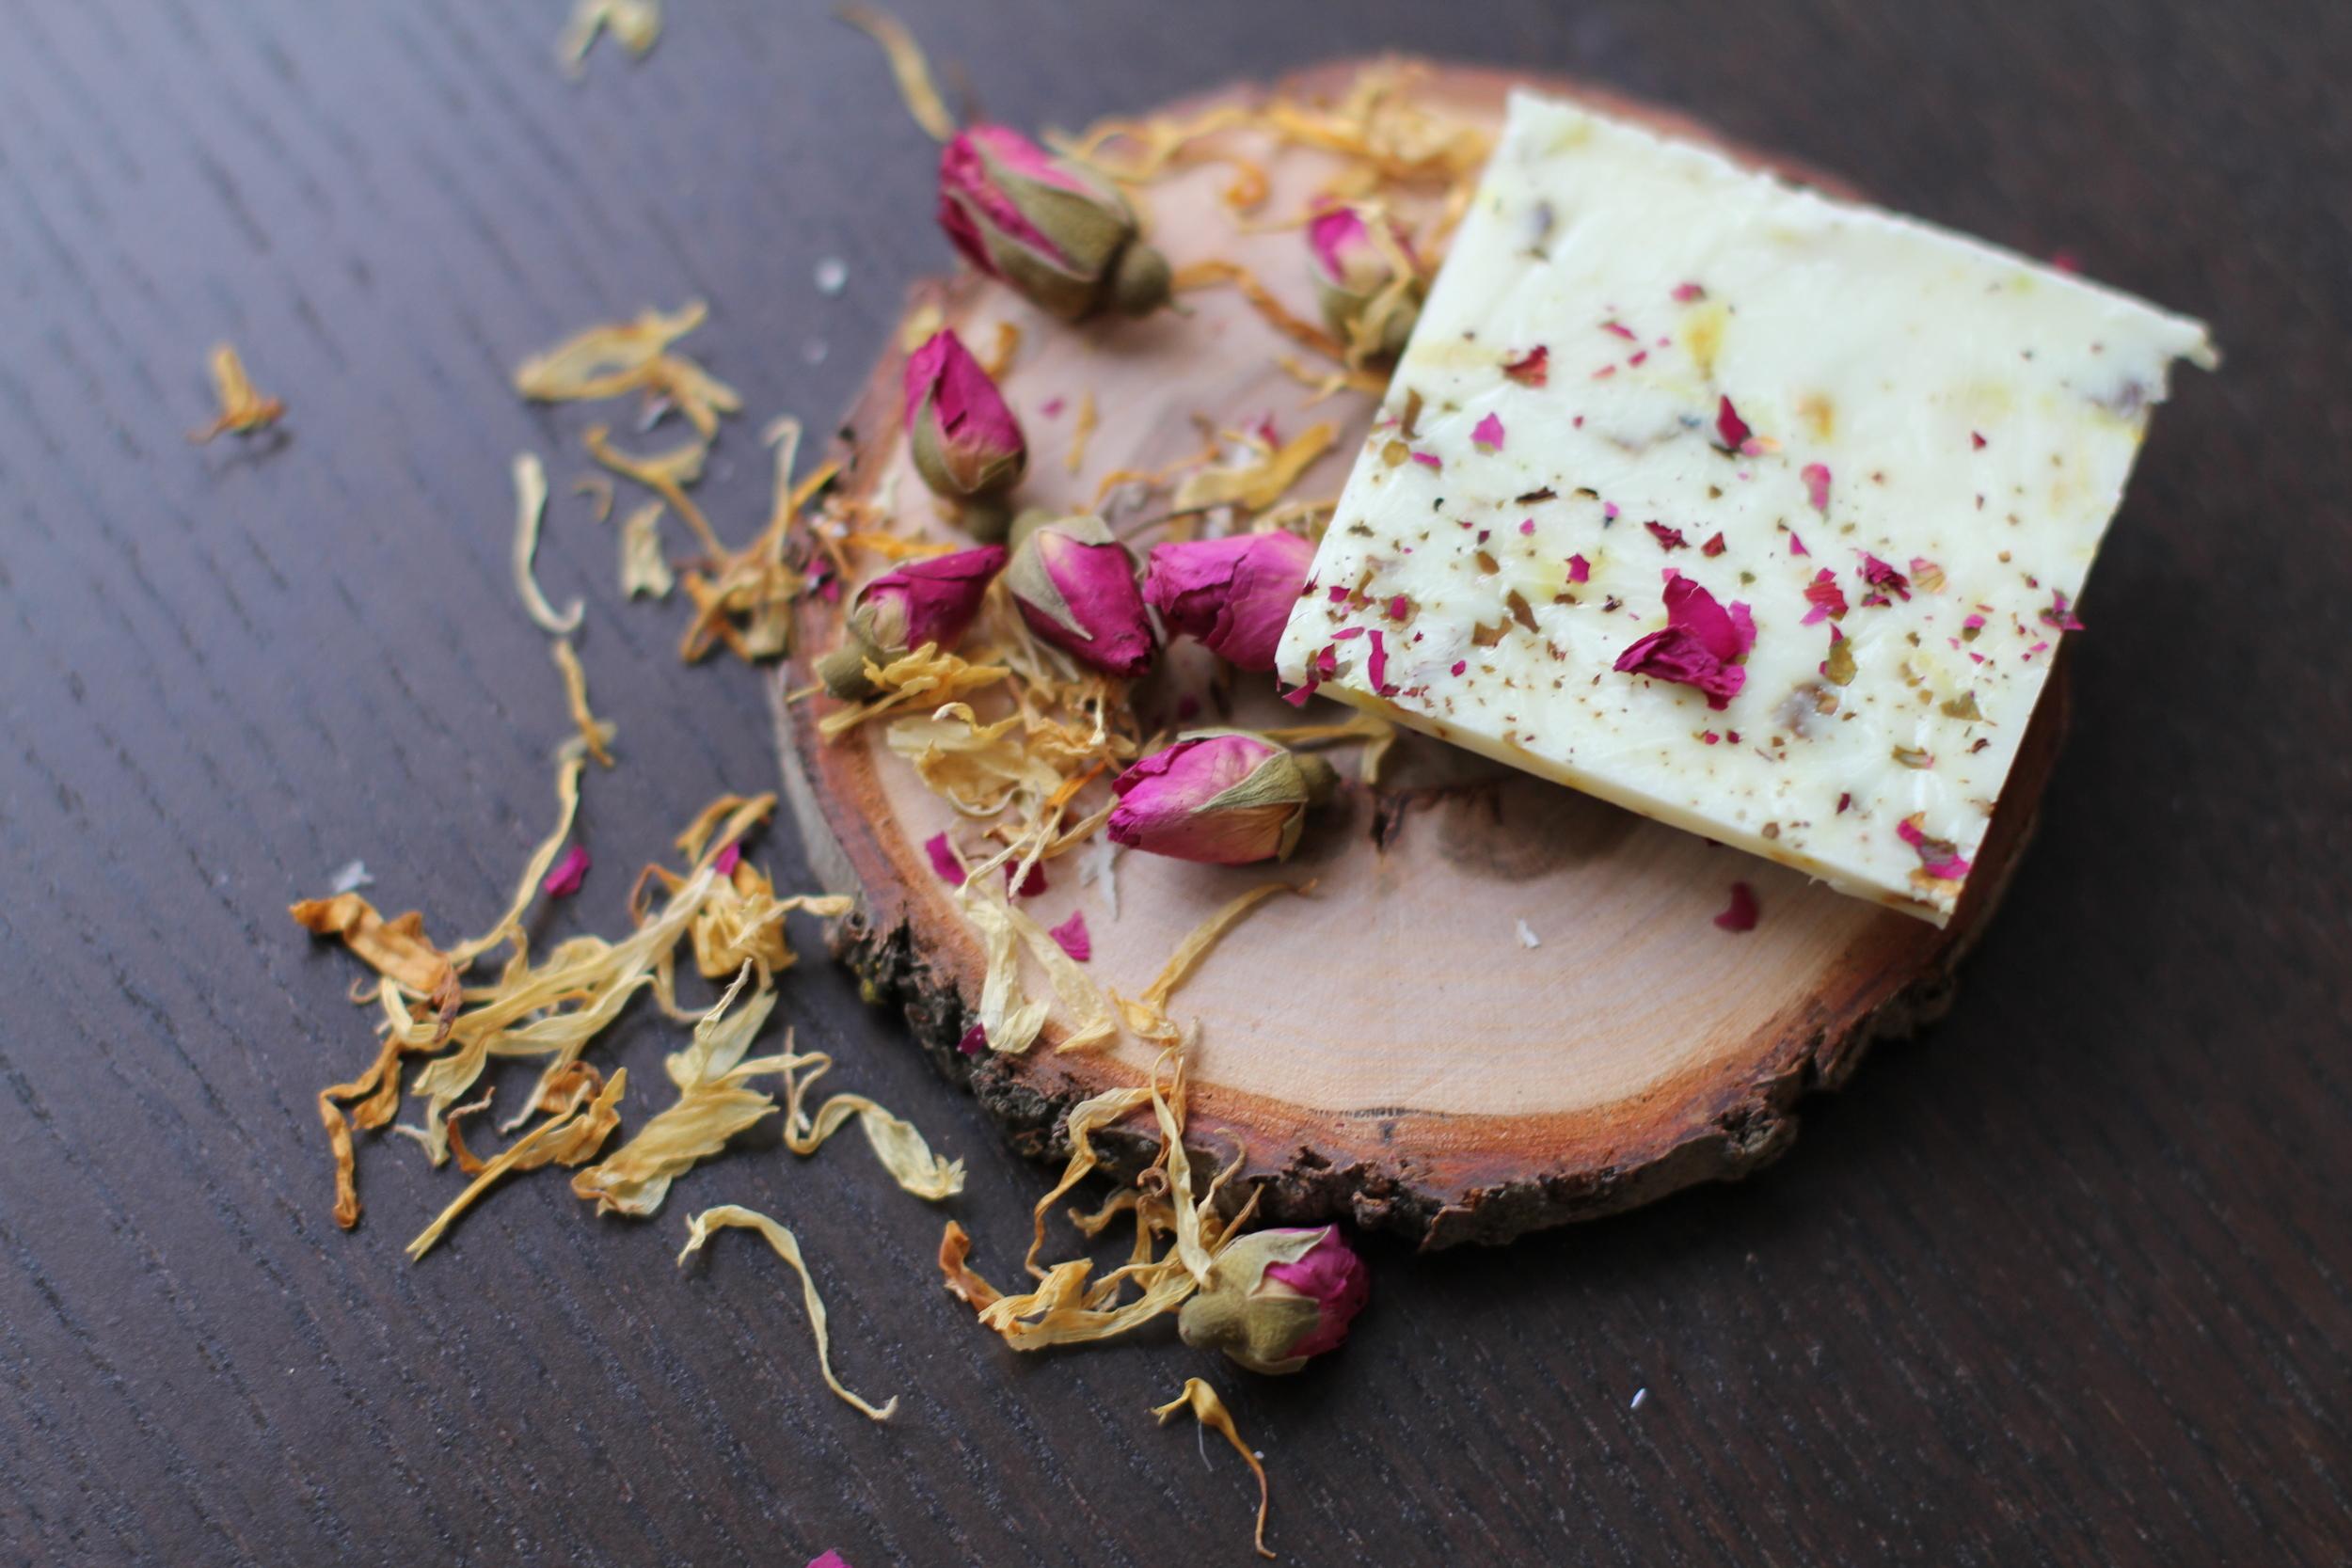 diy hydrating herbal soap botanical medicine recipe calendula rose dr briana lutz